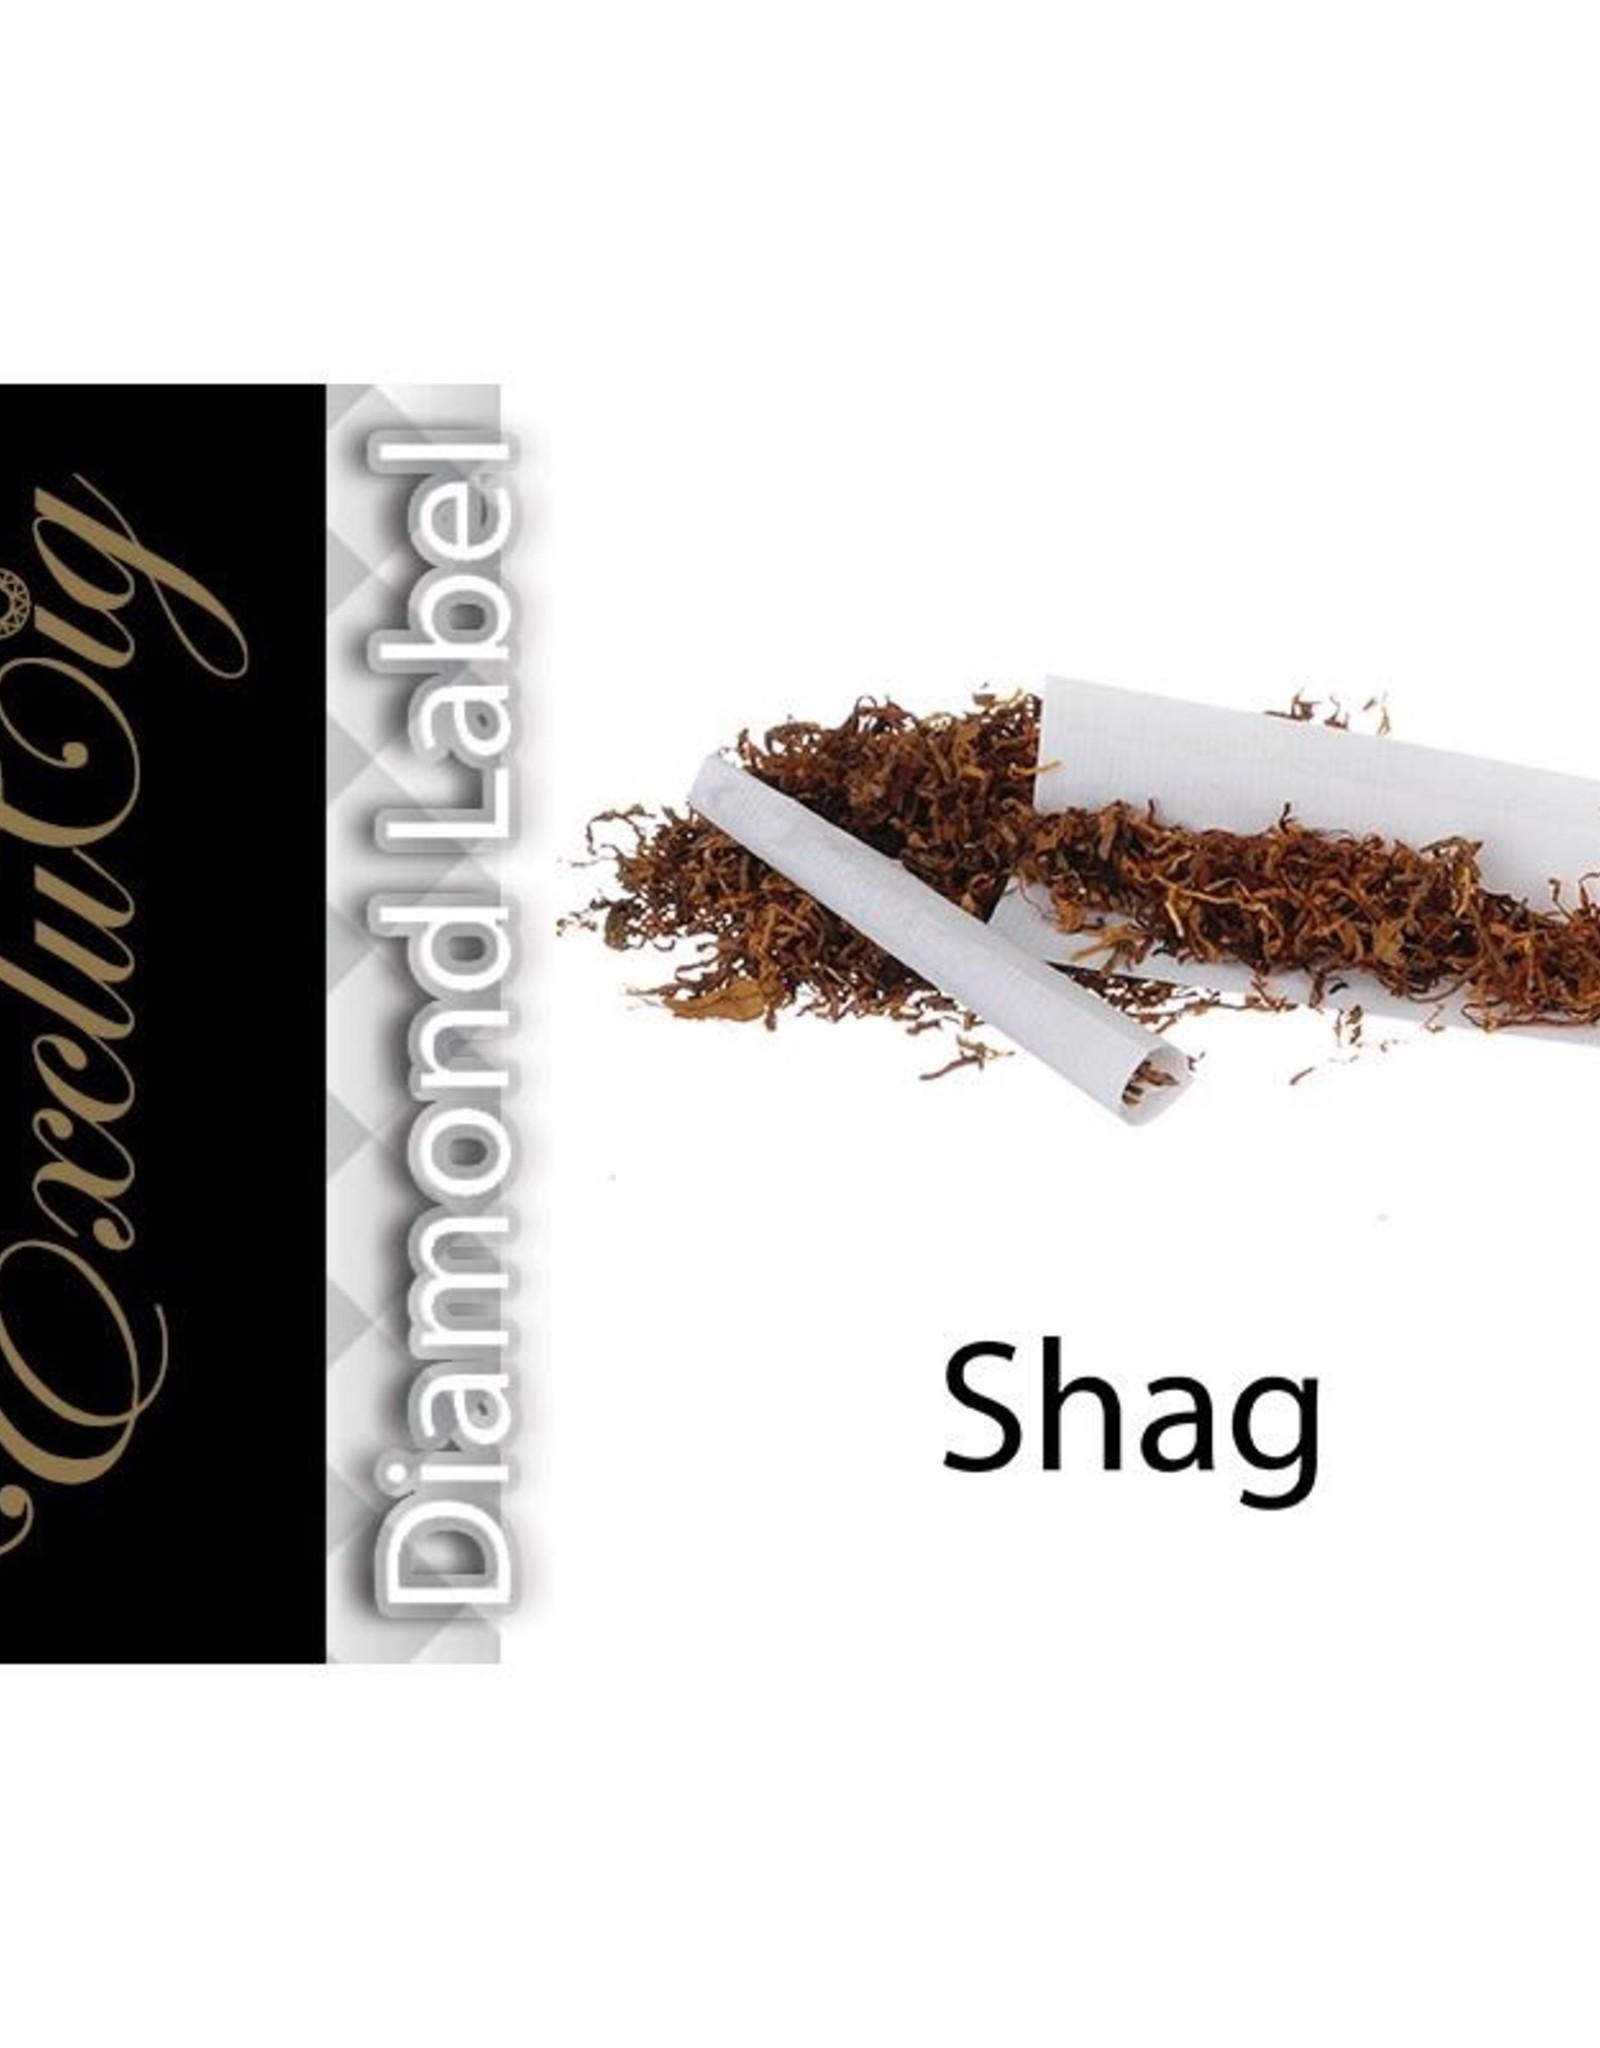 Exclucig Exclucig Diamond Label E-liquid Shag 3 mg Nicotine